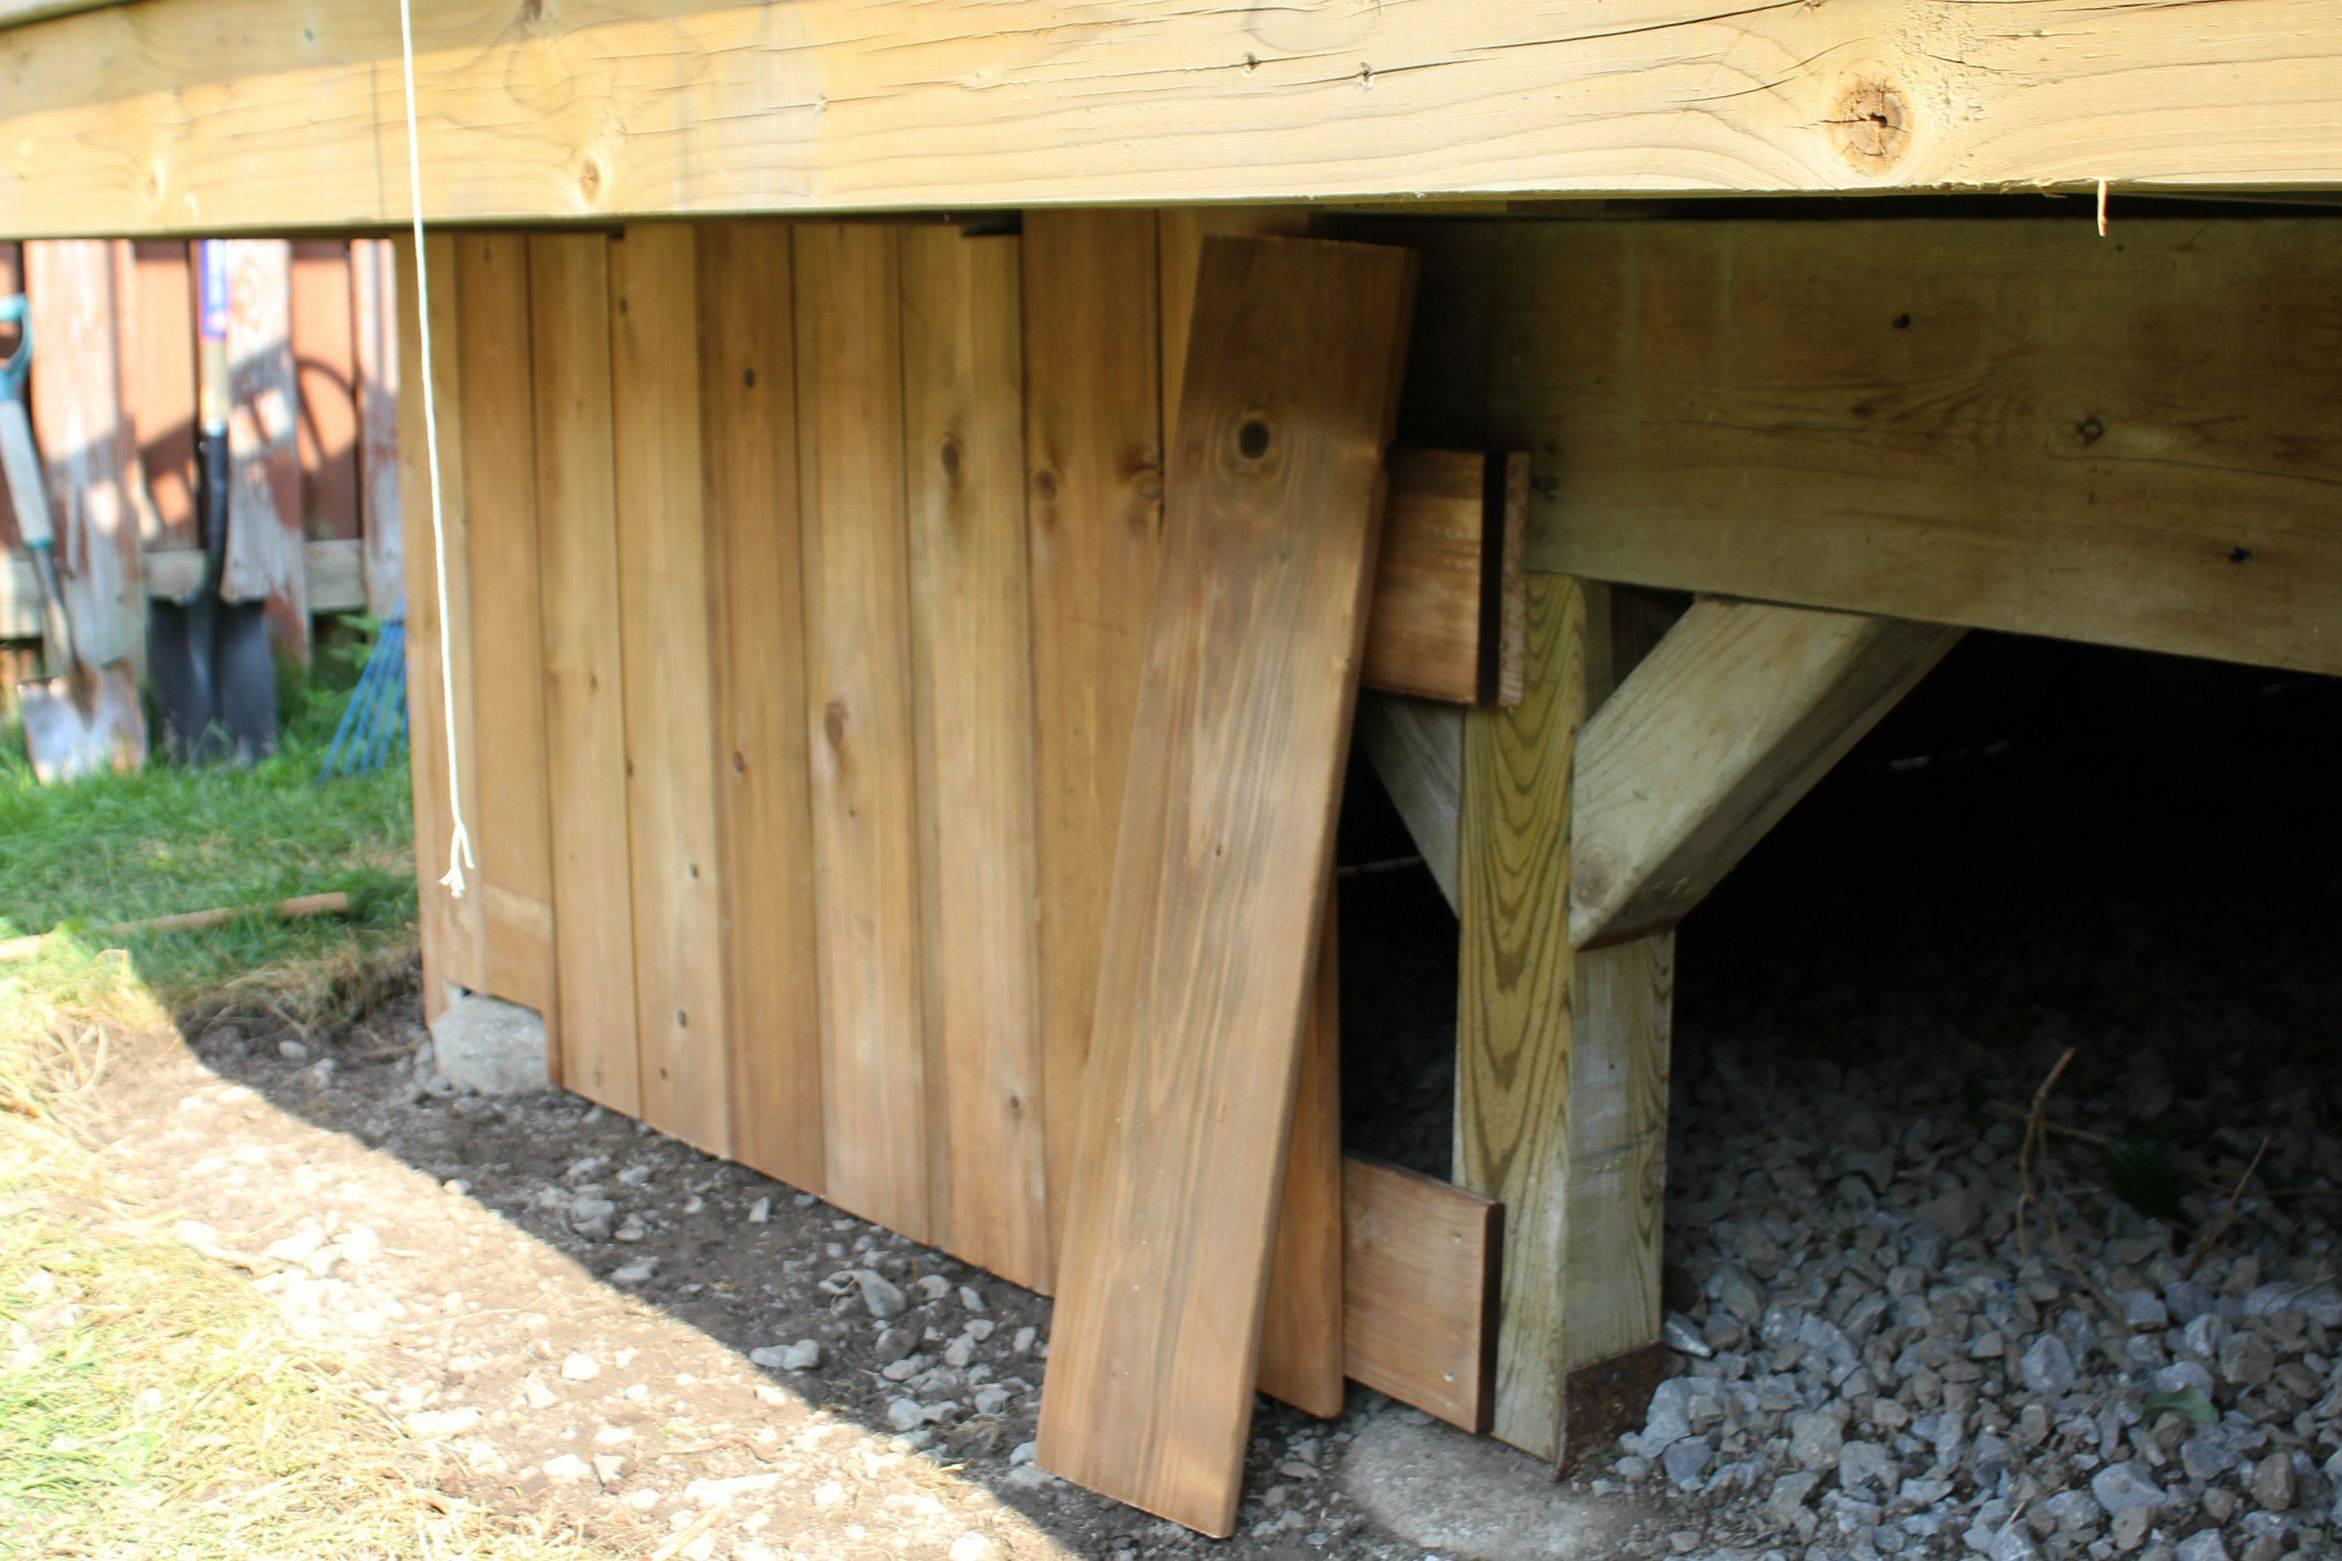 Turtles Tails Under Deck Enclosure Access Door